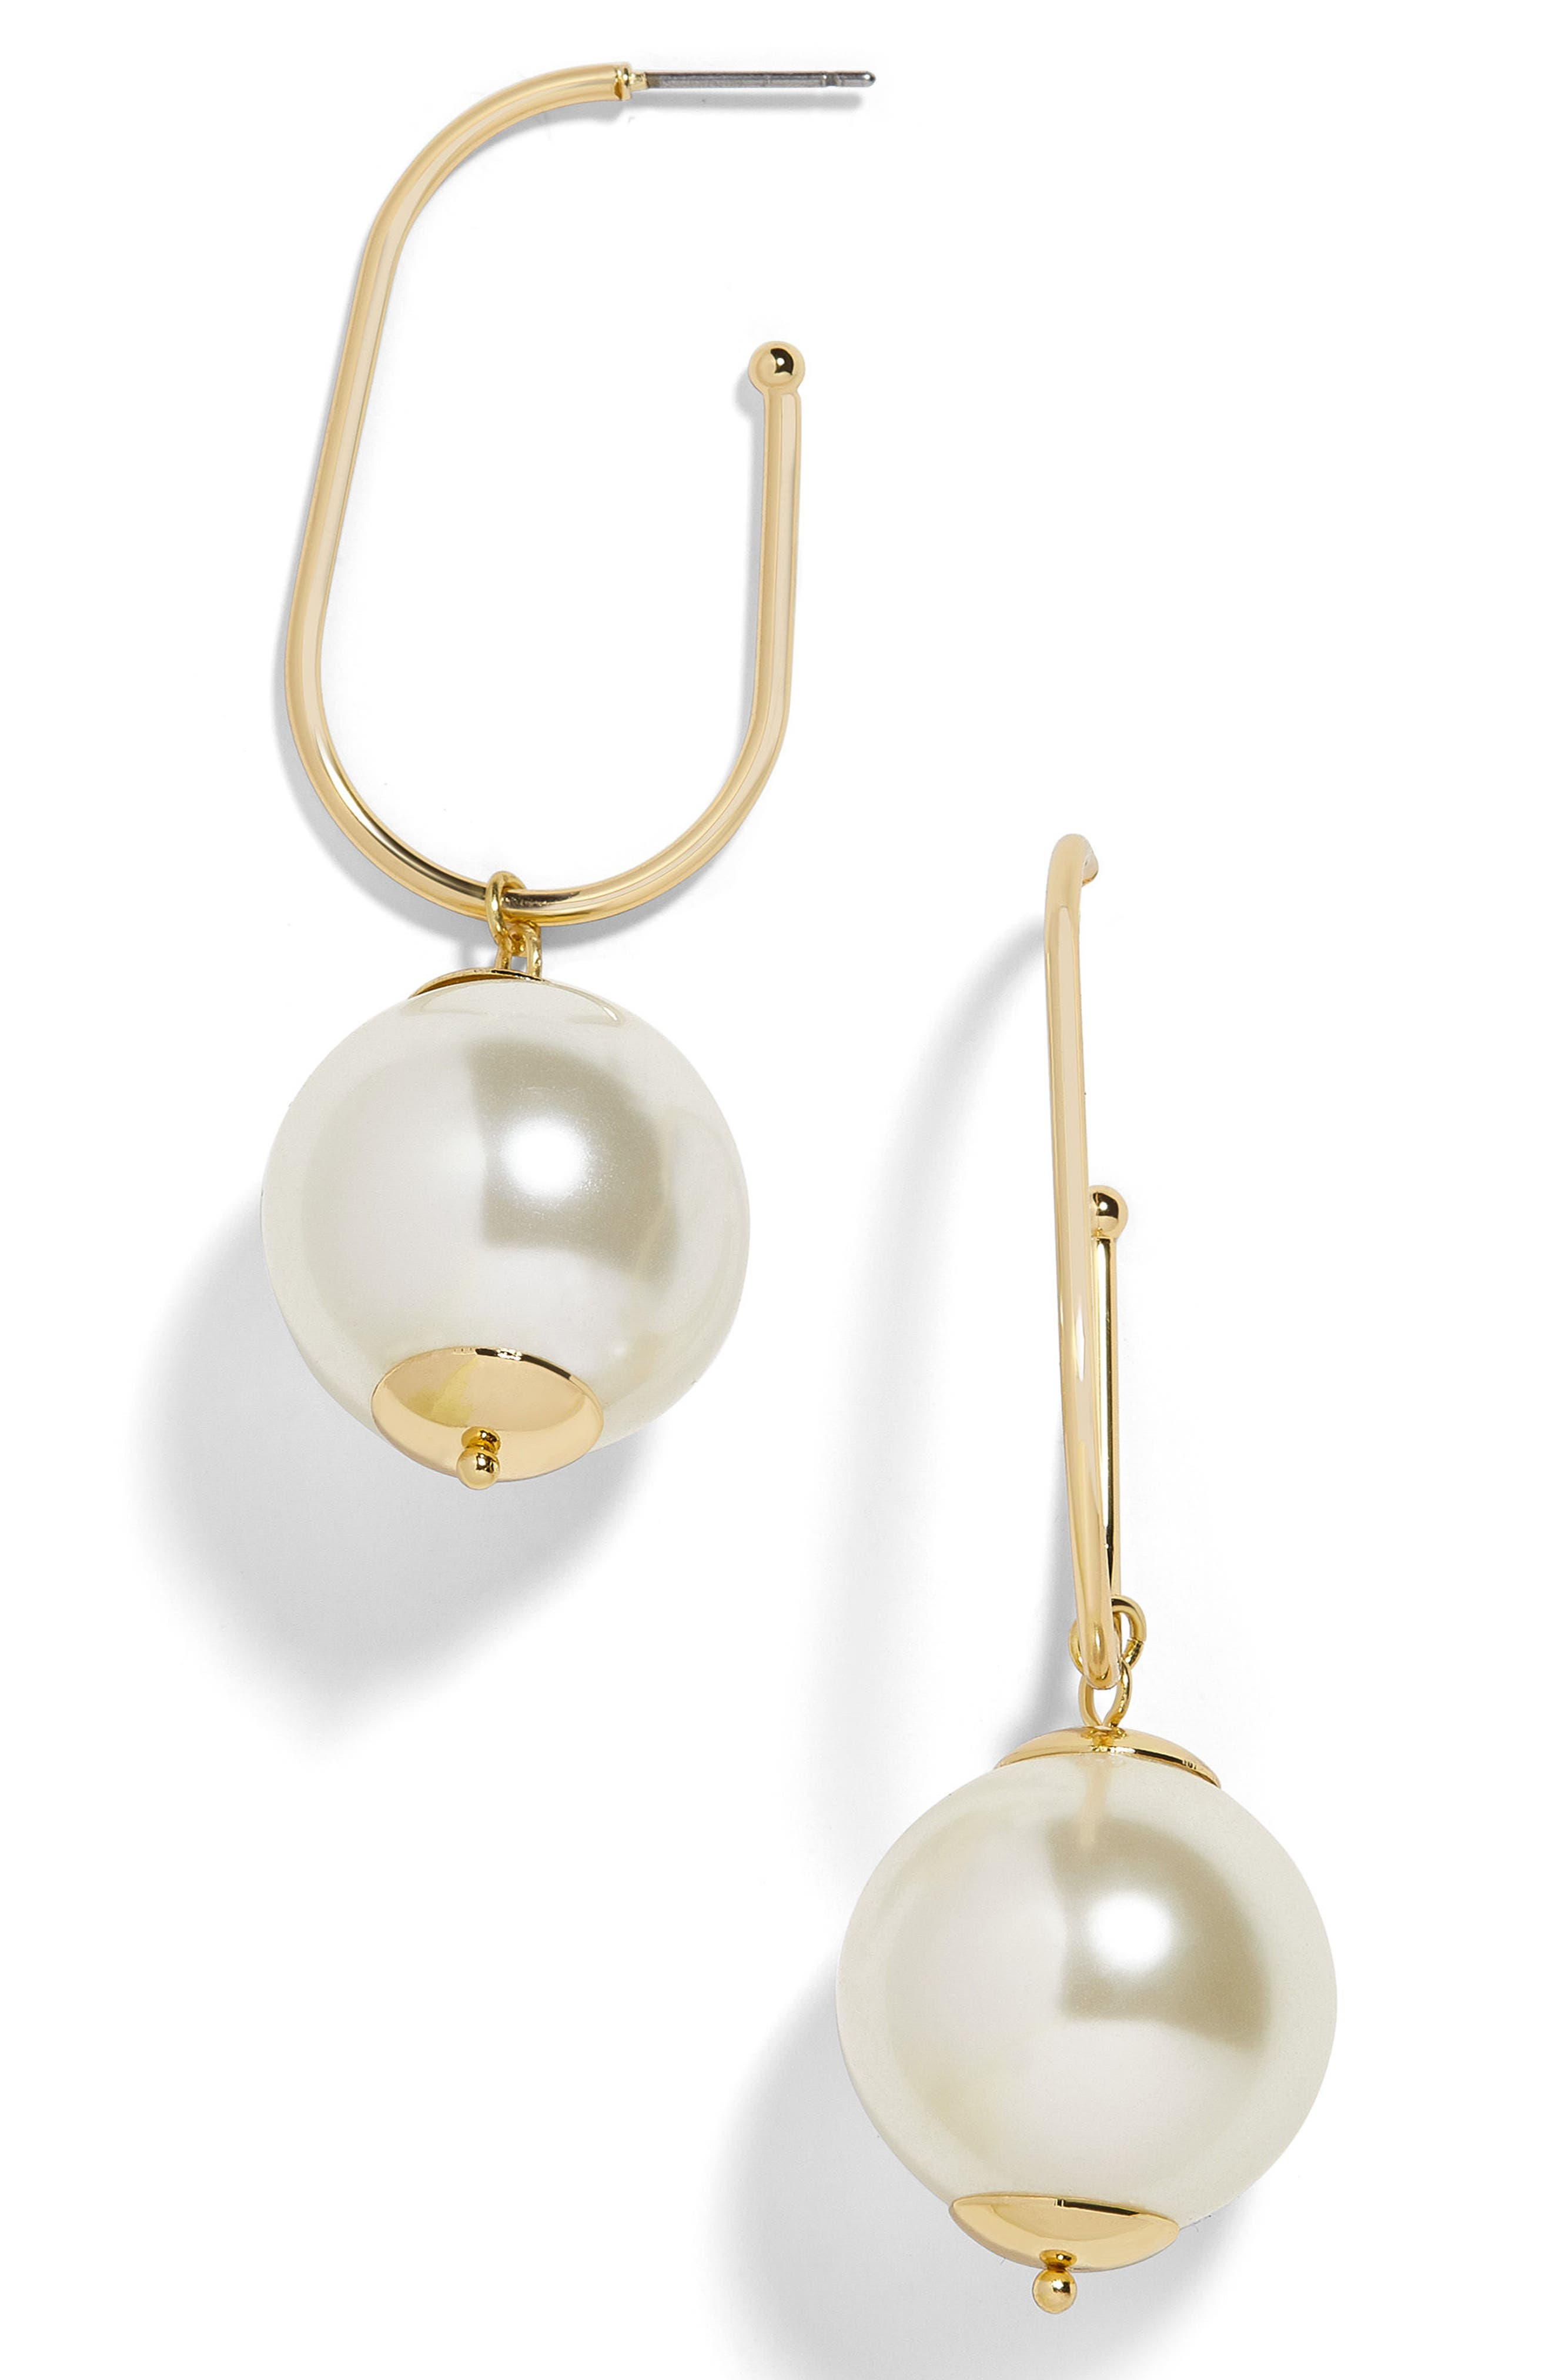 Main Image - BaubleBar Shelby Imitation Pearl Drop Earrings